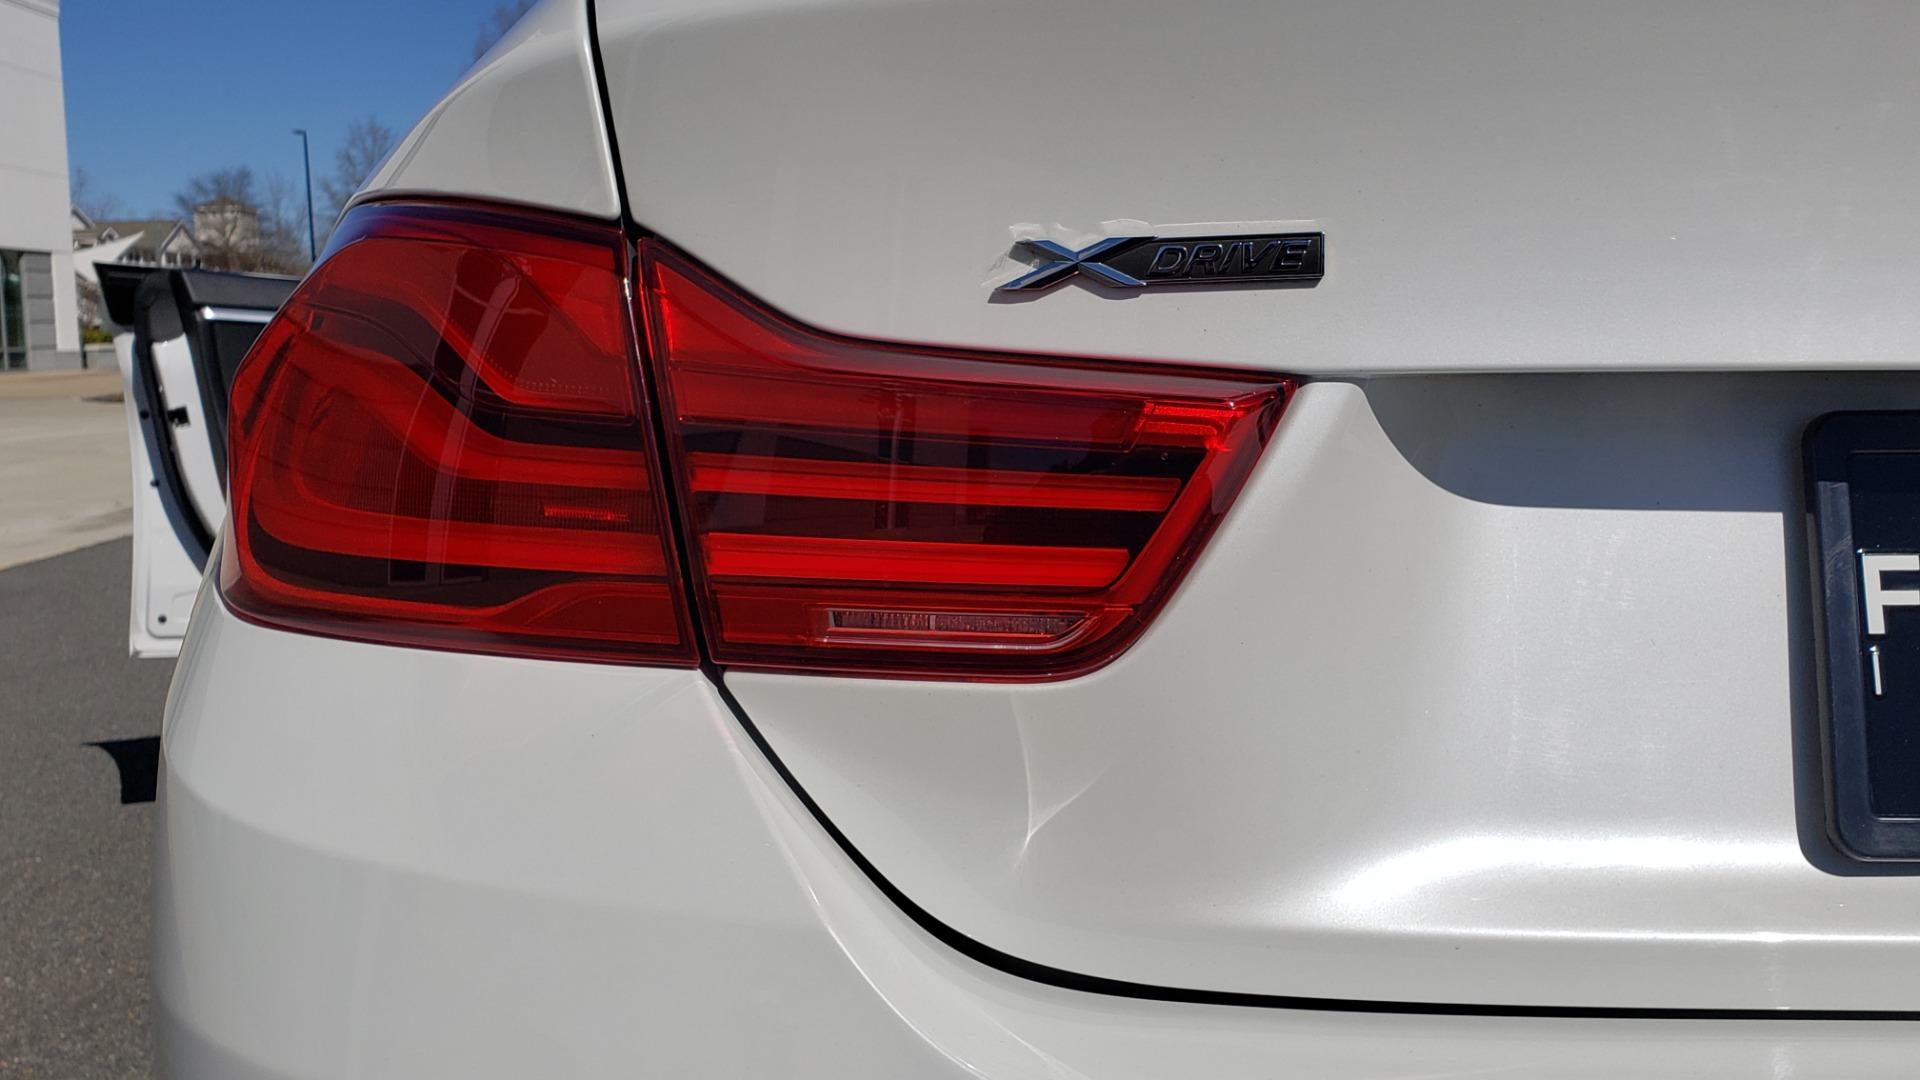 Used 2018 BMW 4 SERIES 430IXDRIVE / PREMIUM / NAV / SUNROOF / ESSENTIALS PKG for sale $28,995 at Formula Imports in Charlotte NC 28227 22